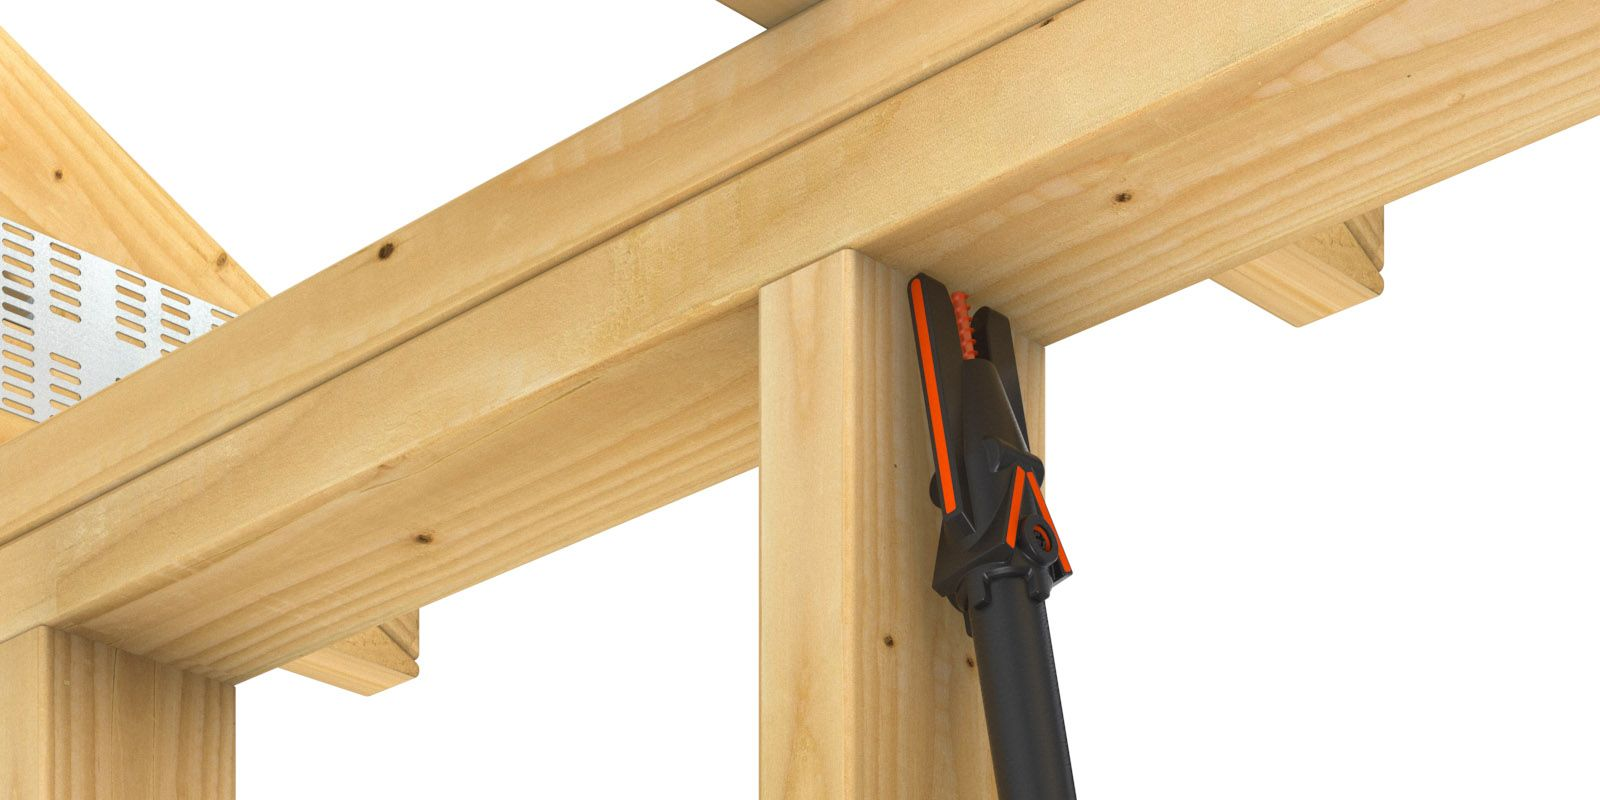 Quik Stik — Easy Overhead Installation